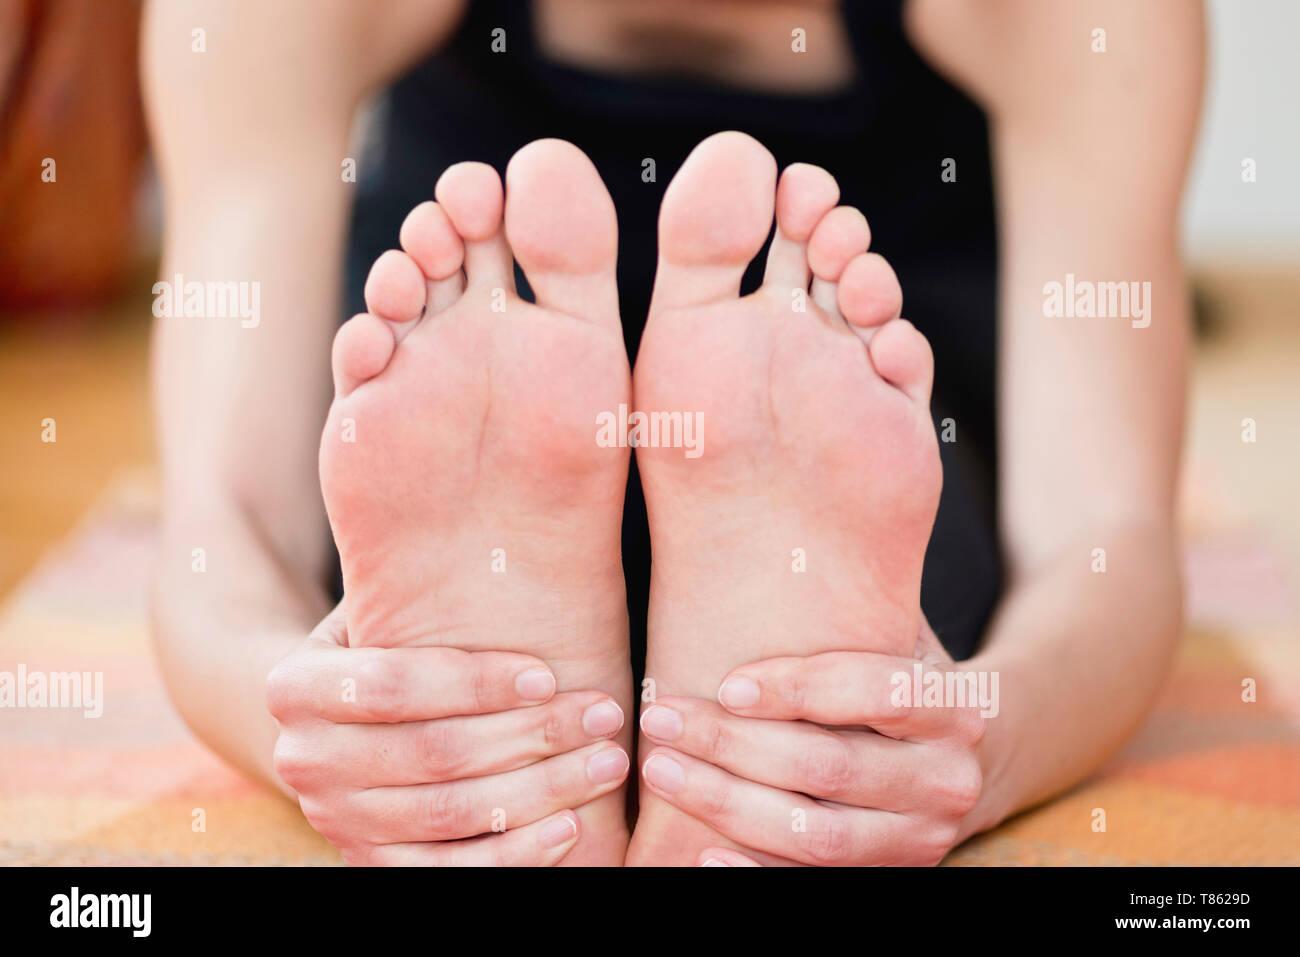 Yoga forward bend - Stock Image